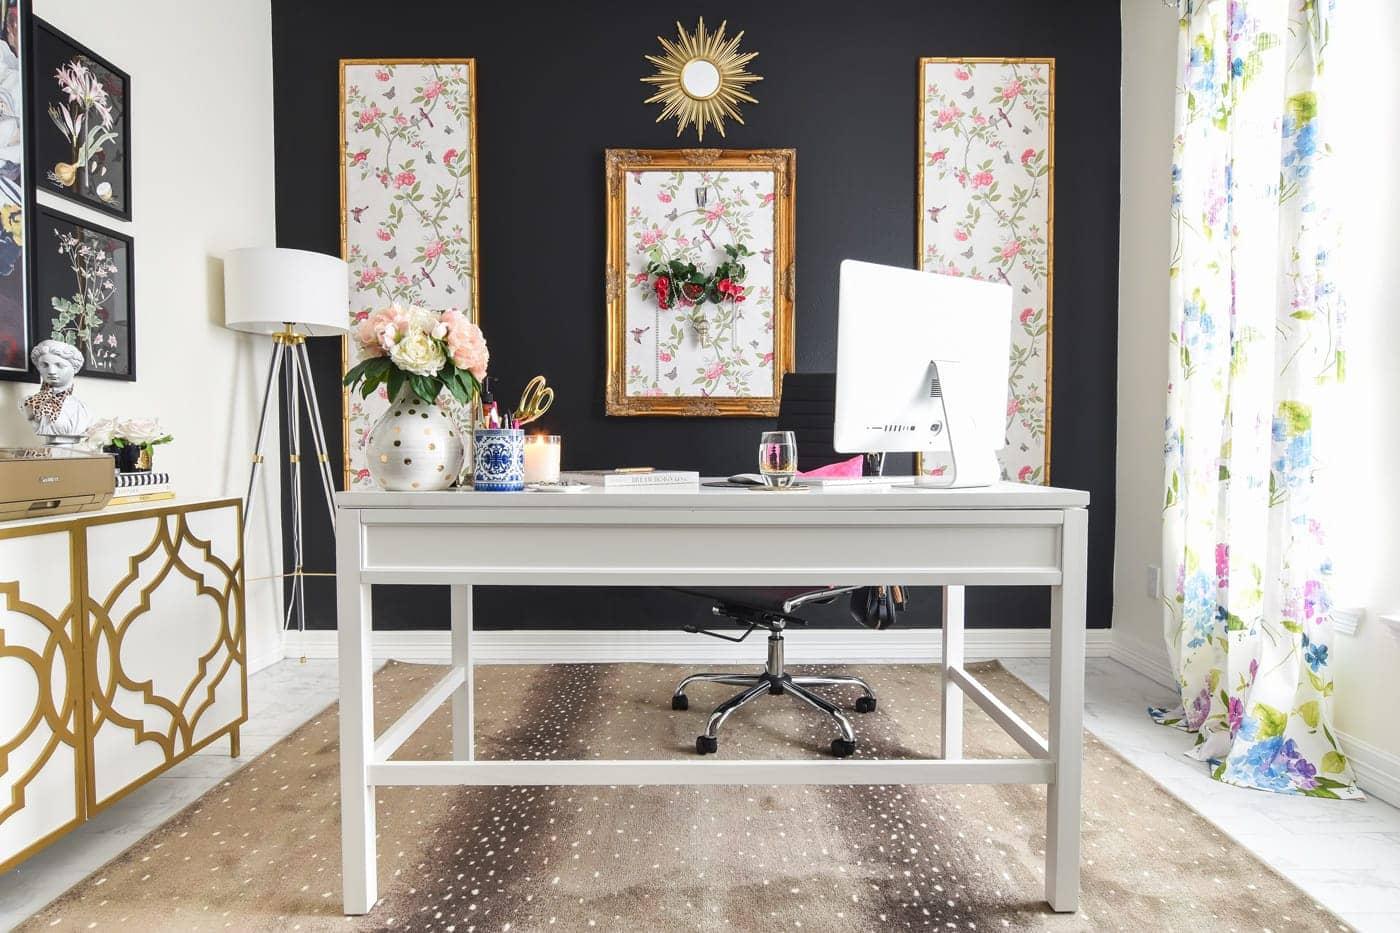 Karastan antelope rug in taupe in a home office